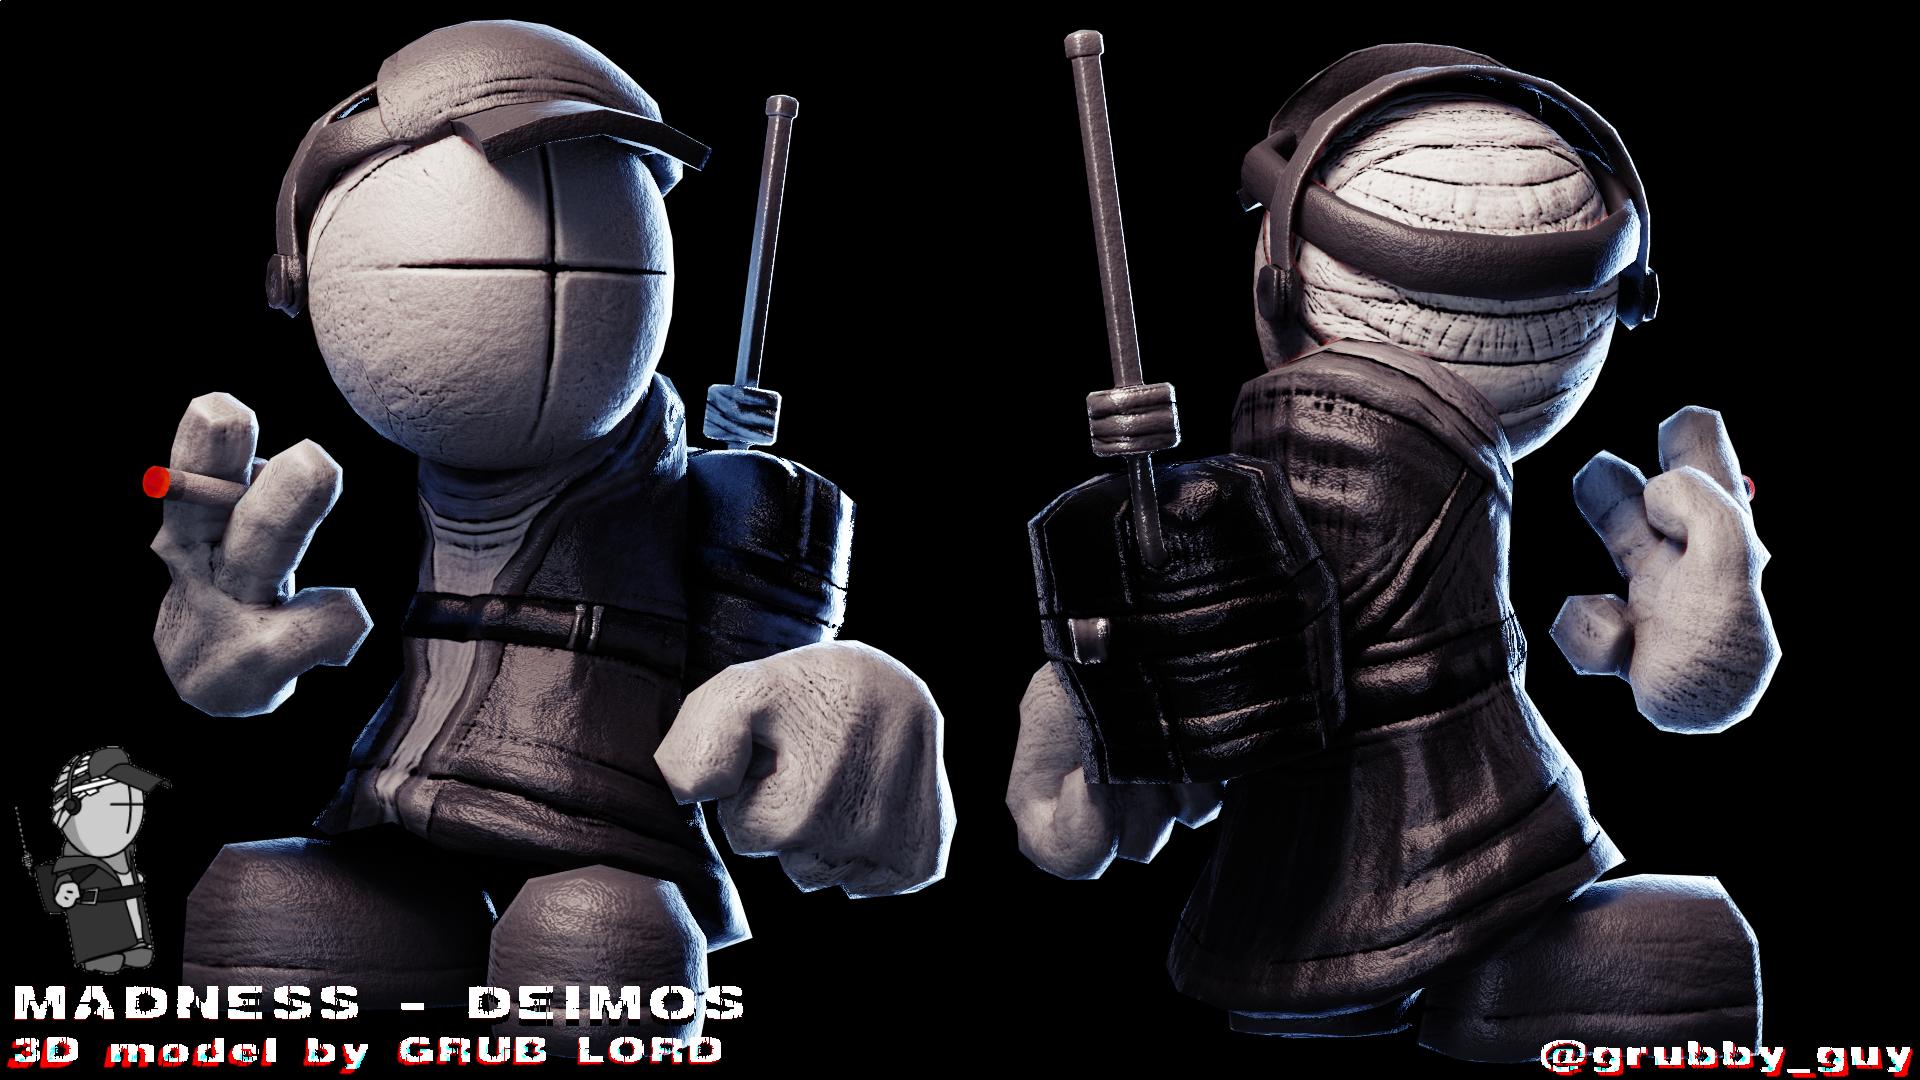 MADNESS - DEIMOS // 3D MODEL